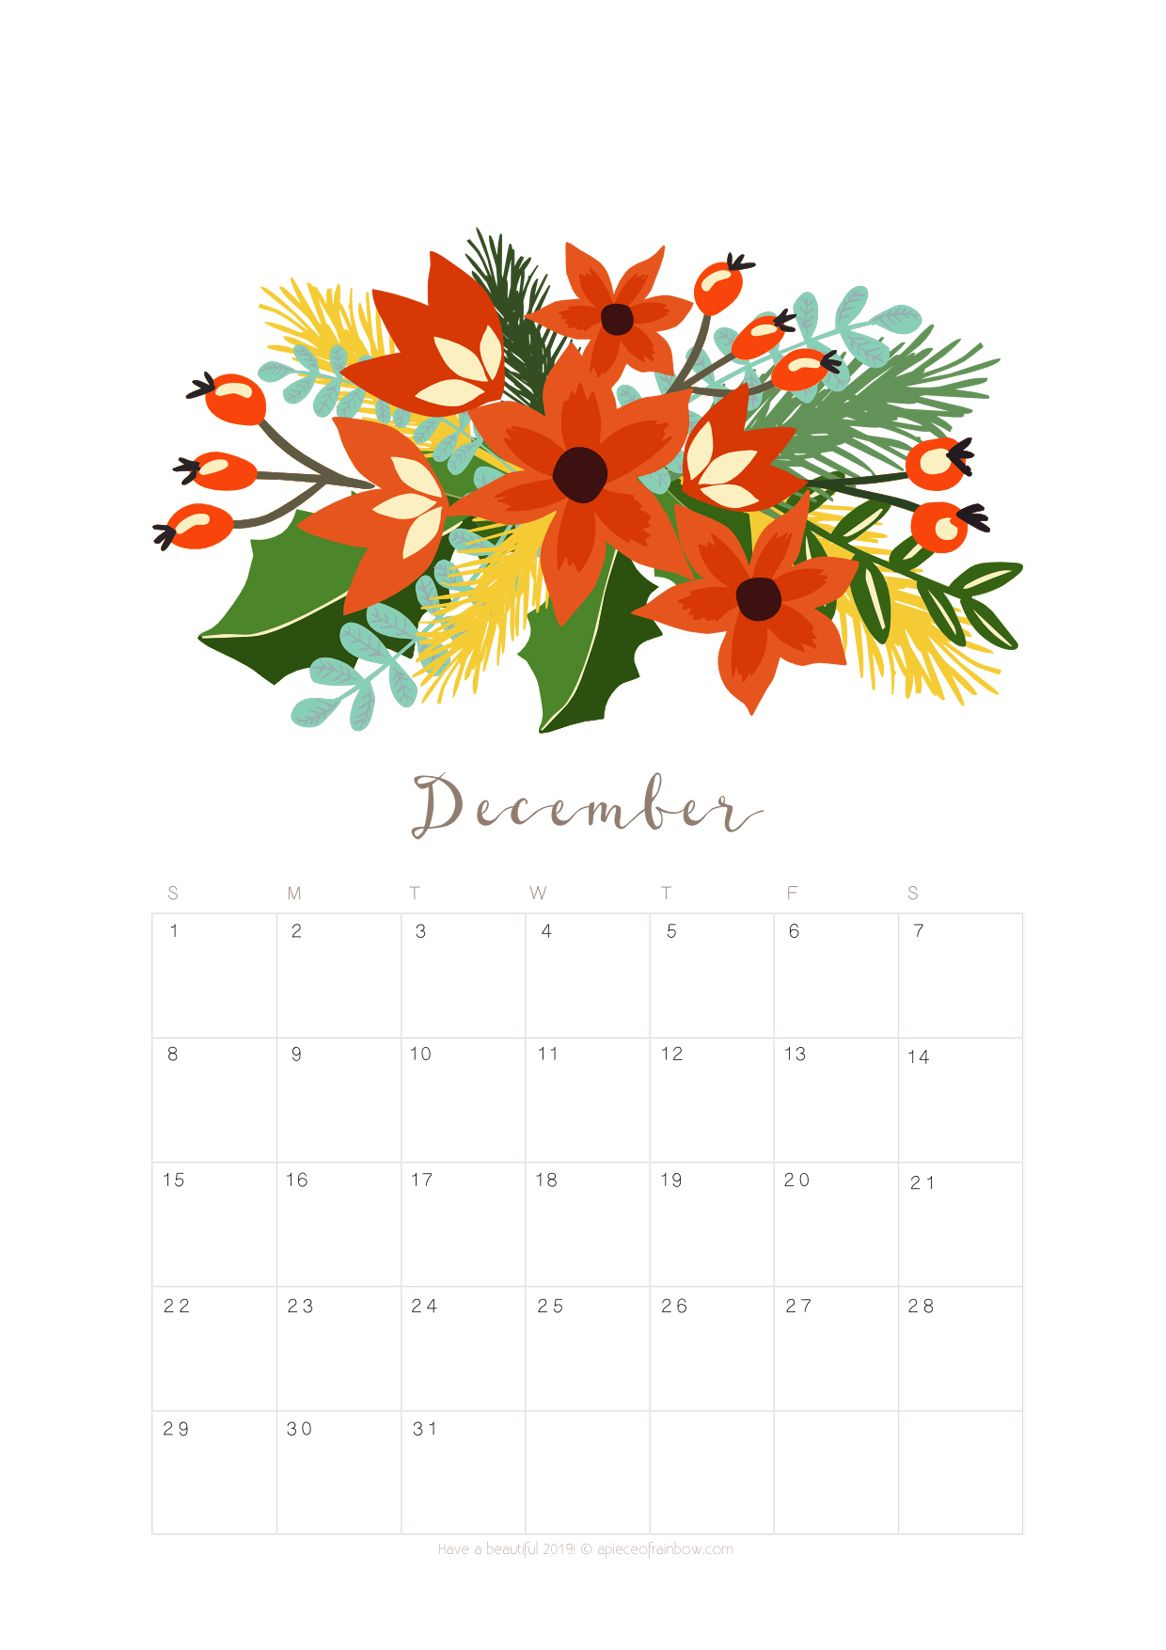 December 2019 Calendar Modern Printable December 2019 Calendar Monthly Planner {2 Designs